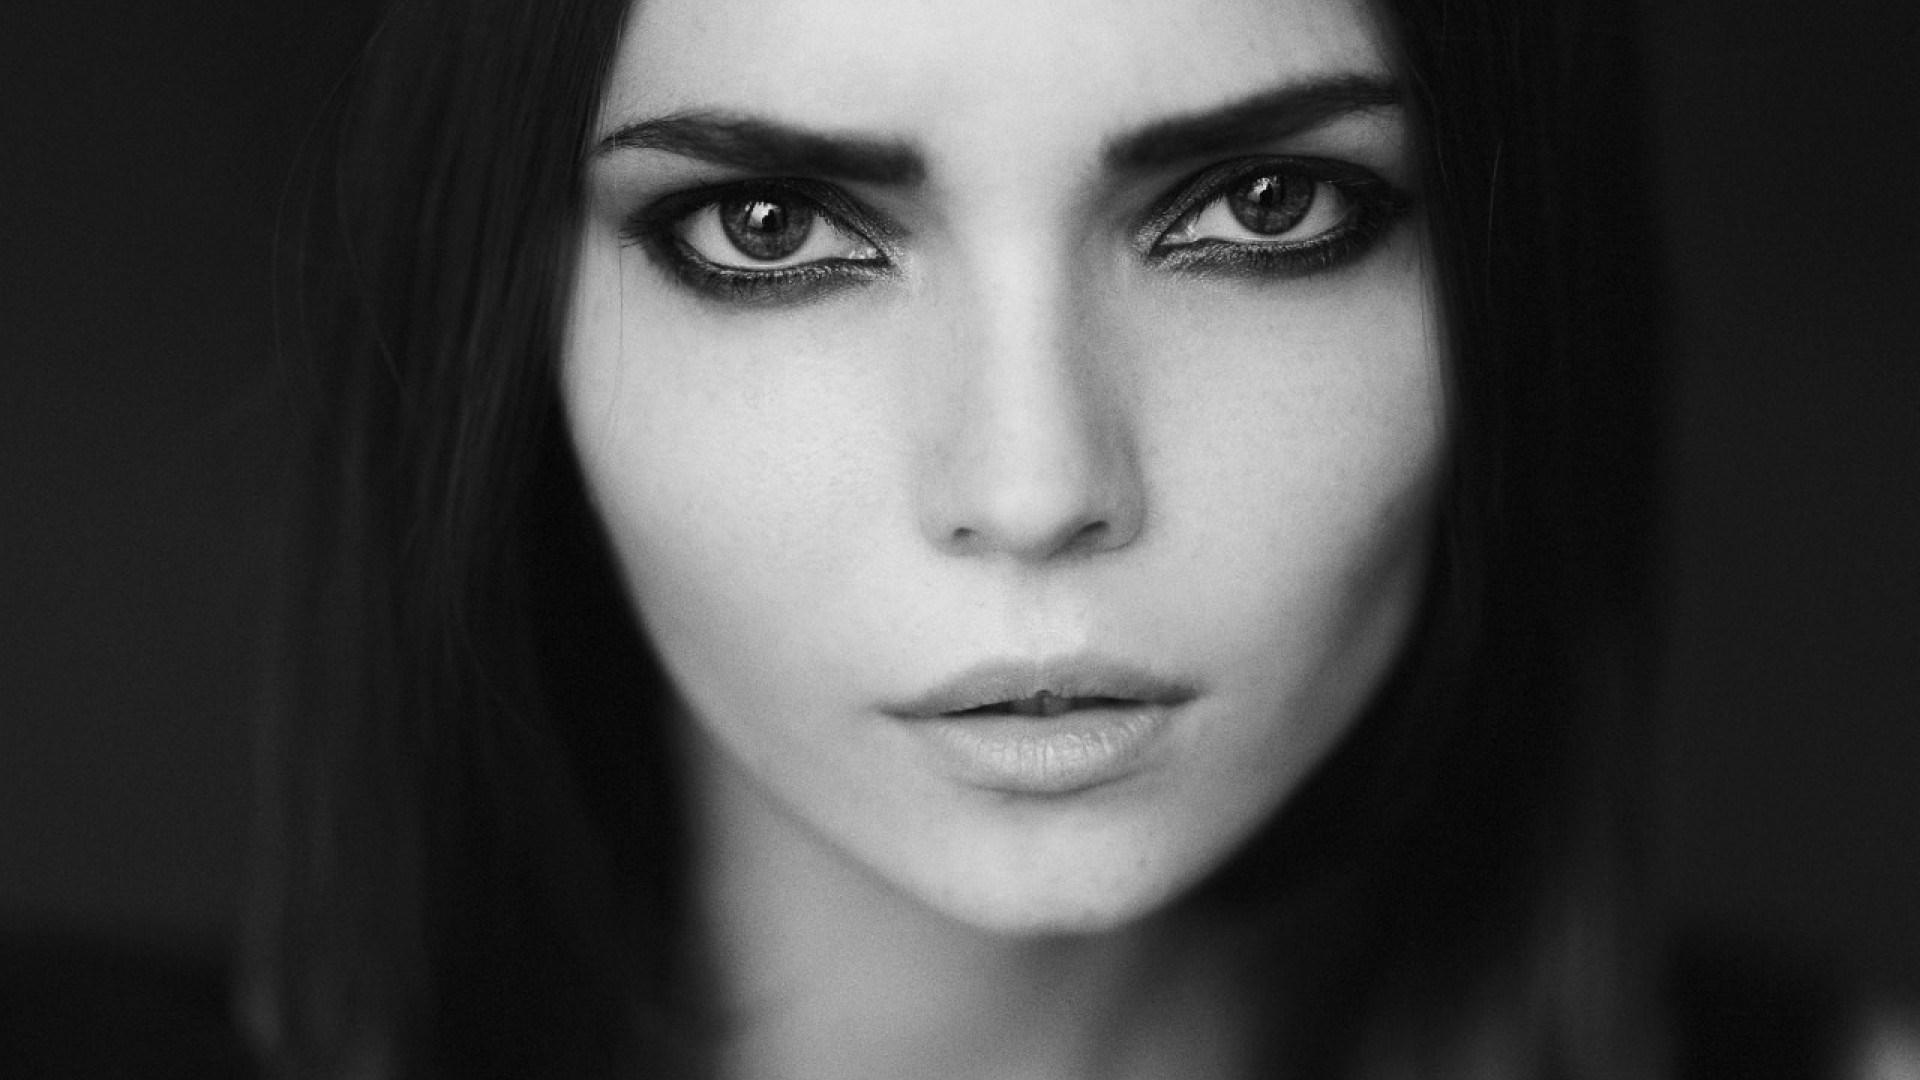 Portrait Photo Girl